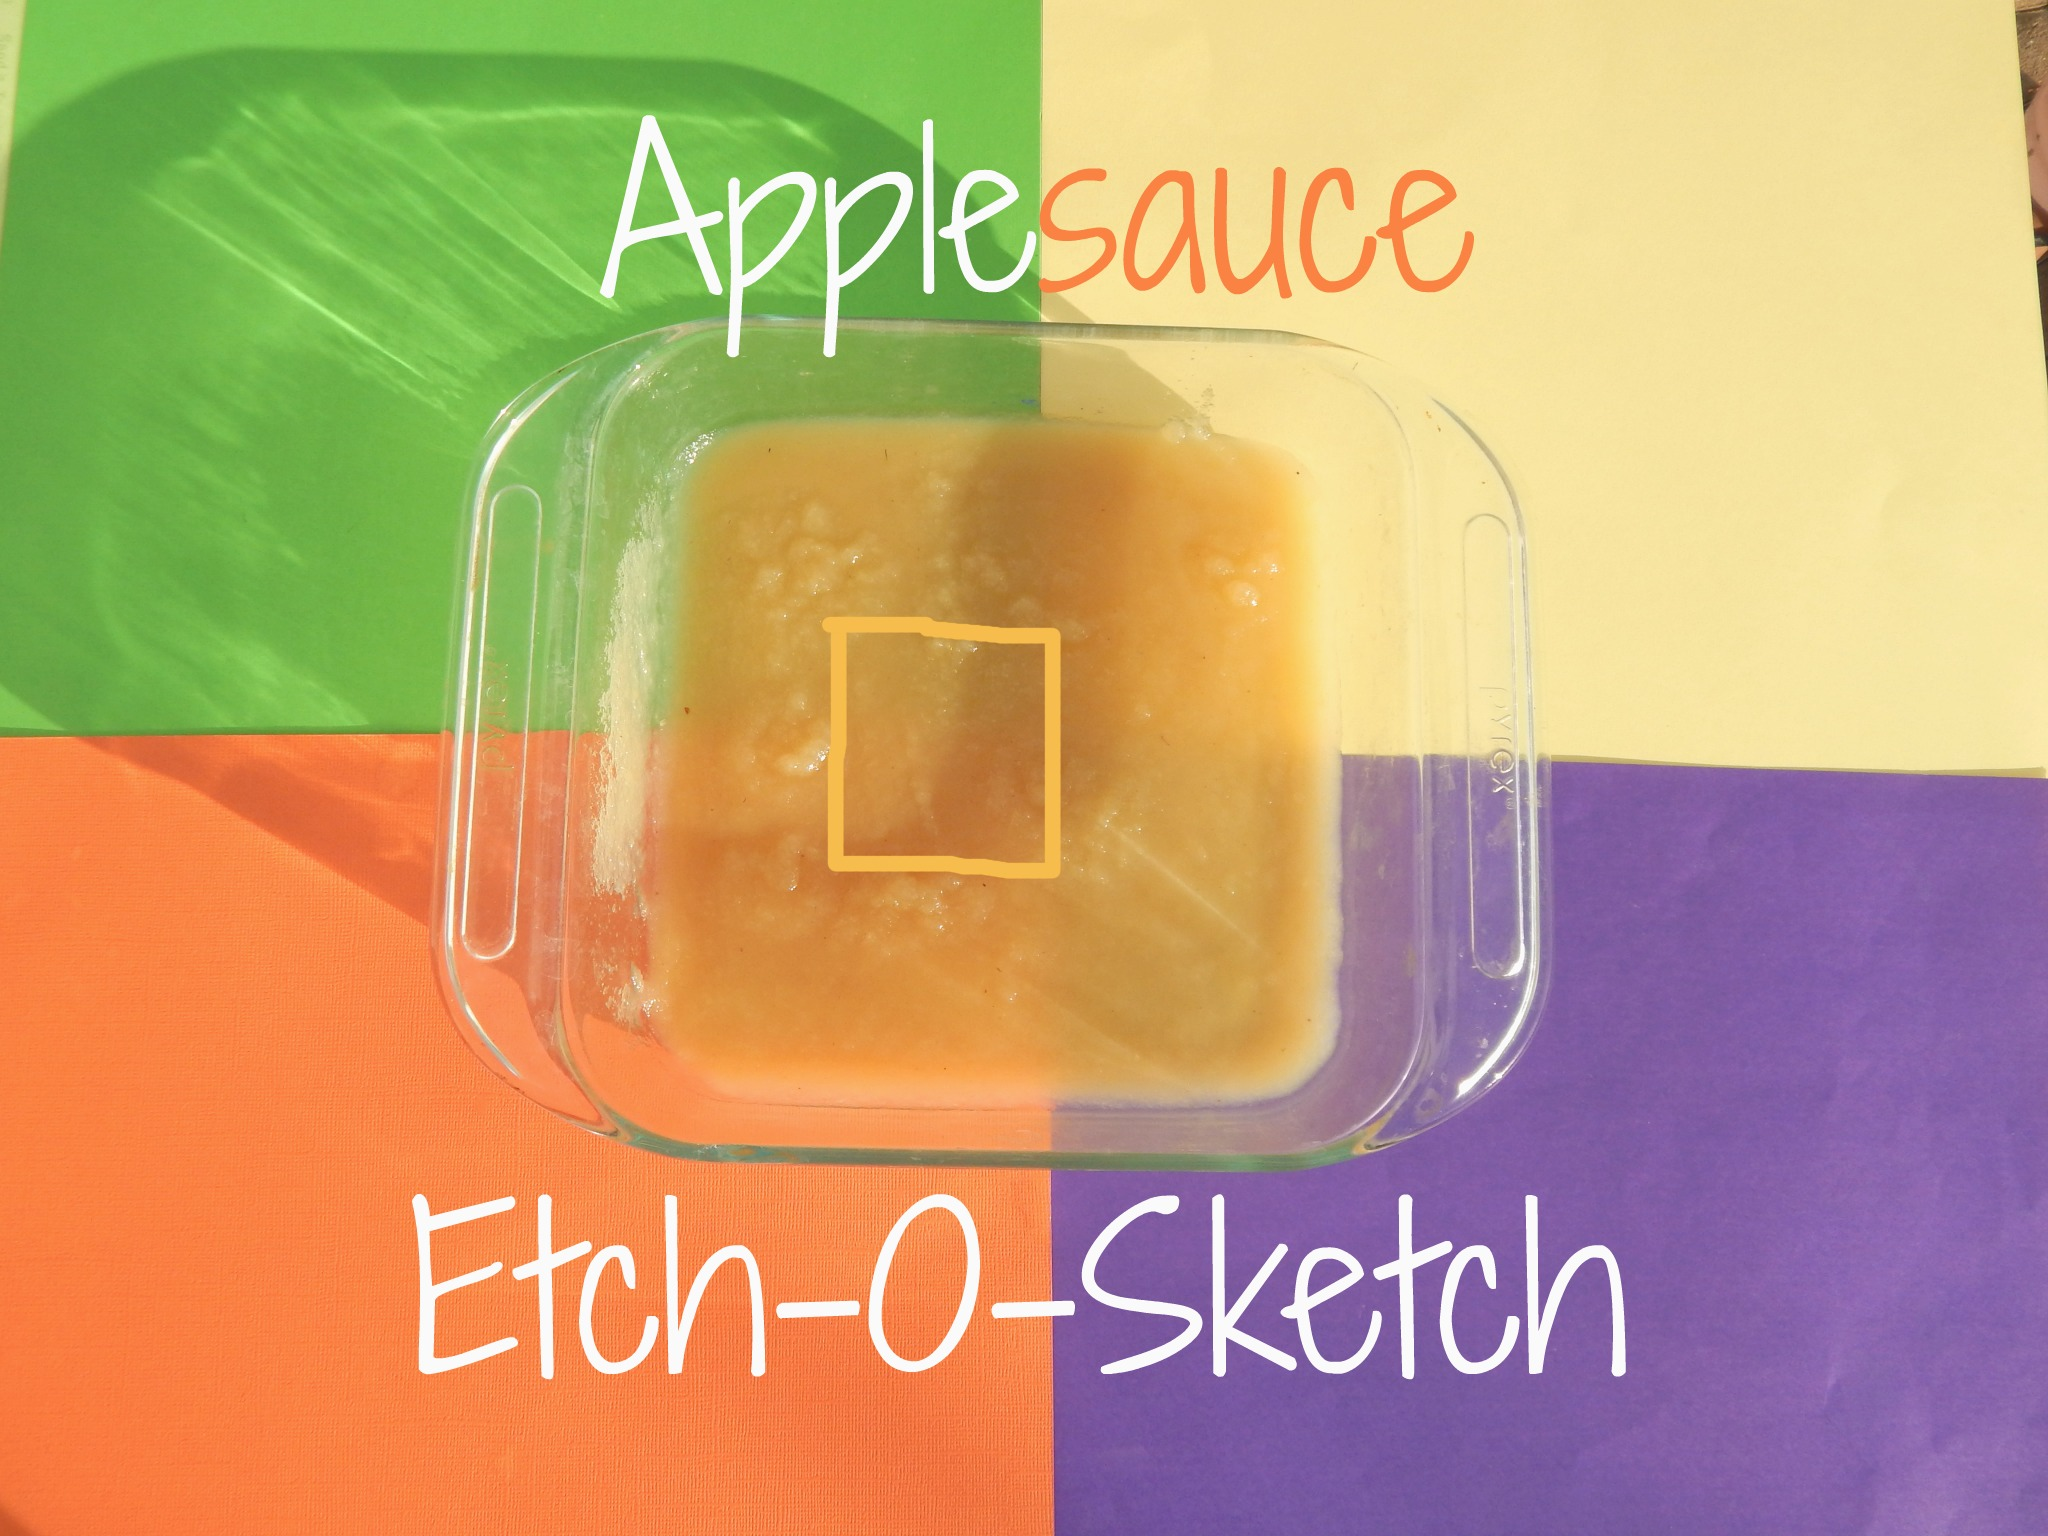 Applesauce Etch O Sketch